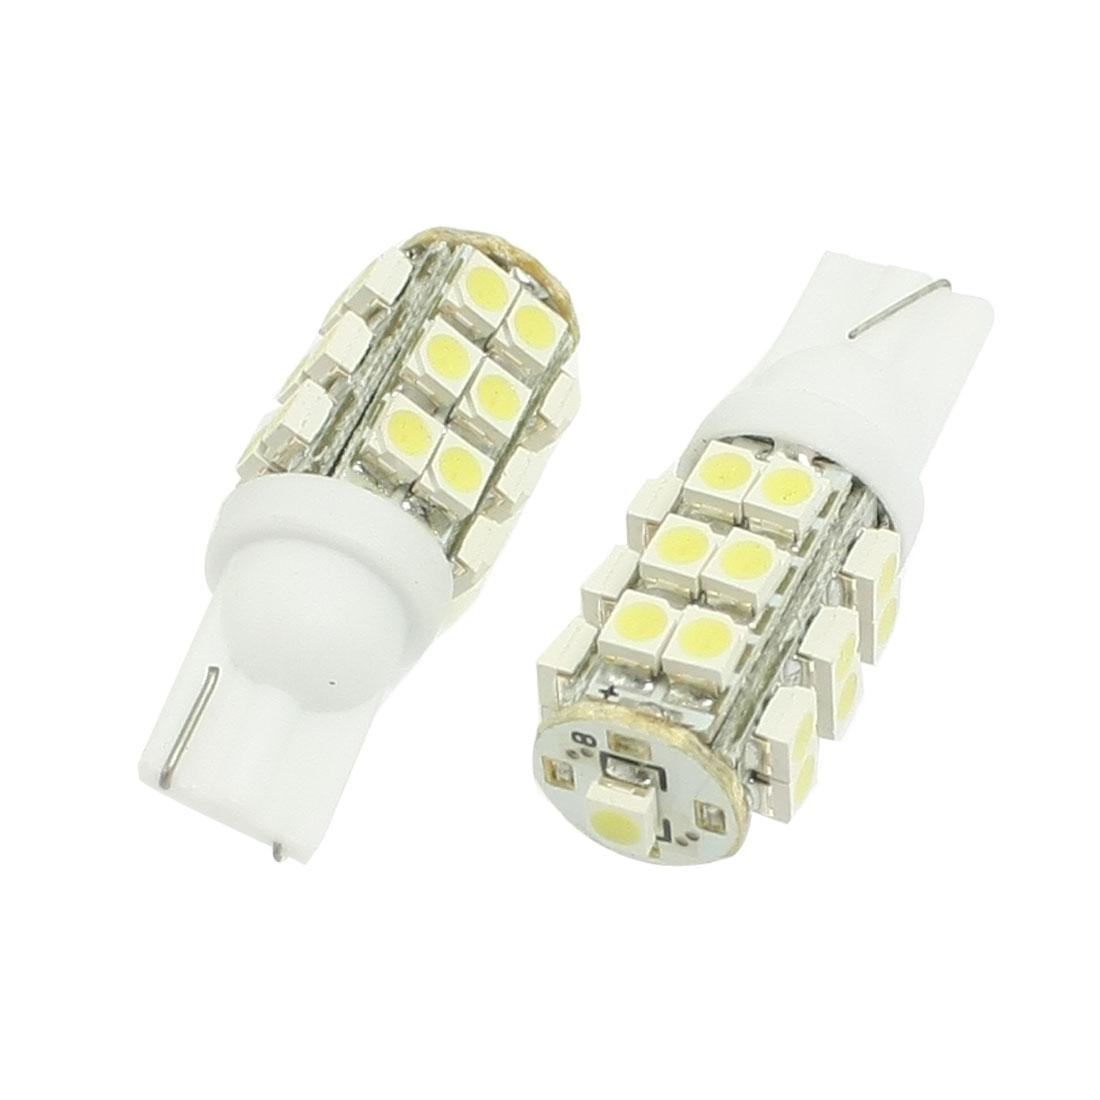 2-Pcs-White-T10-W5W-904-1210-SMD-25-LED-Indicator-Sidemarker-Lights-Bulbs